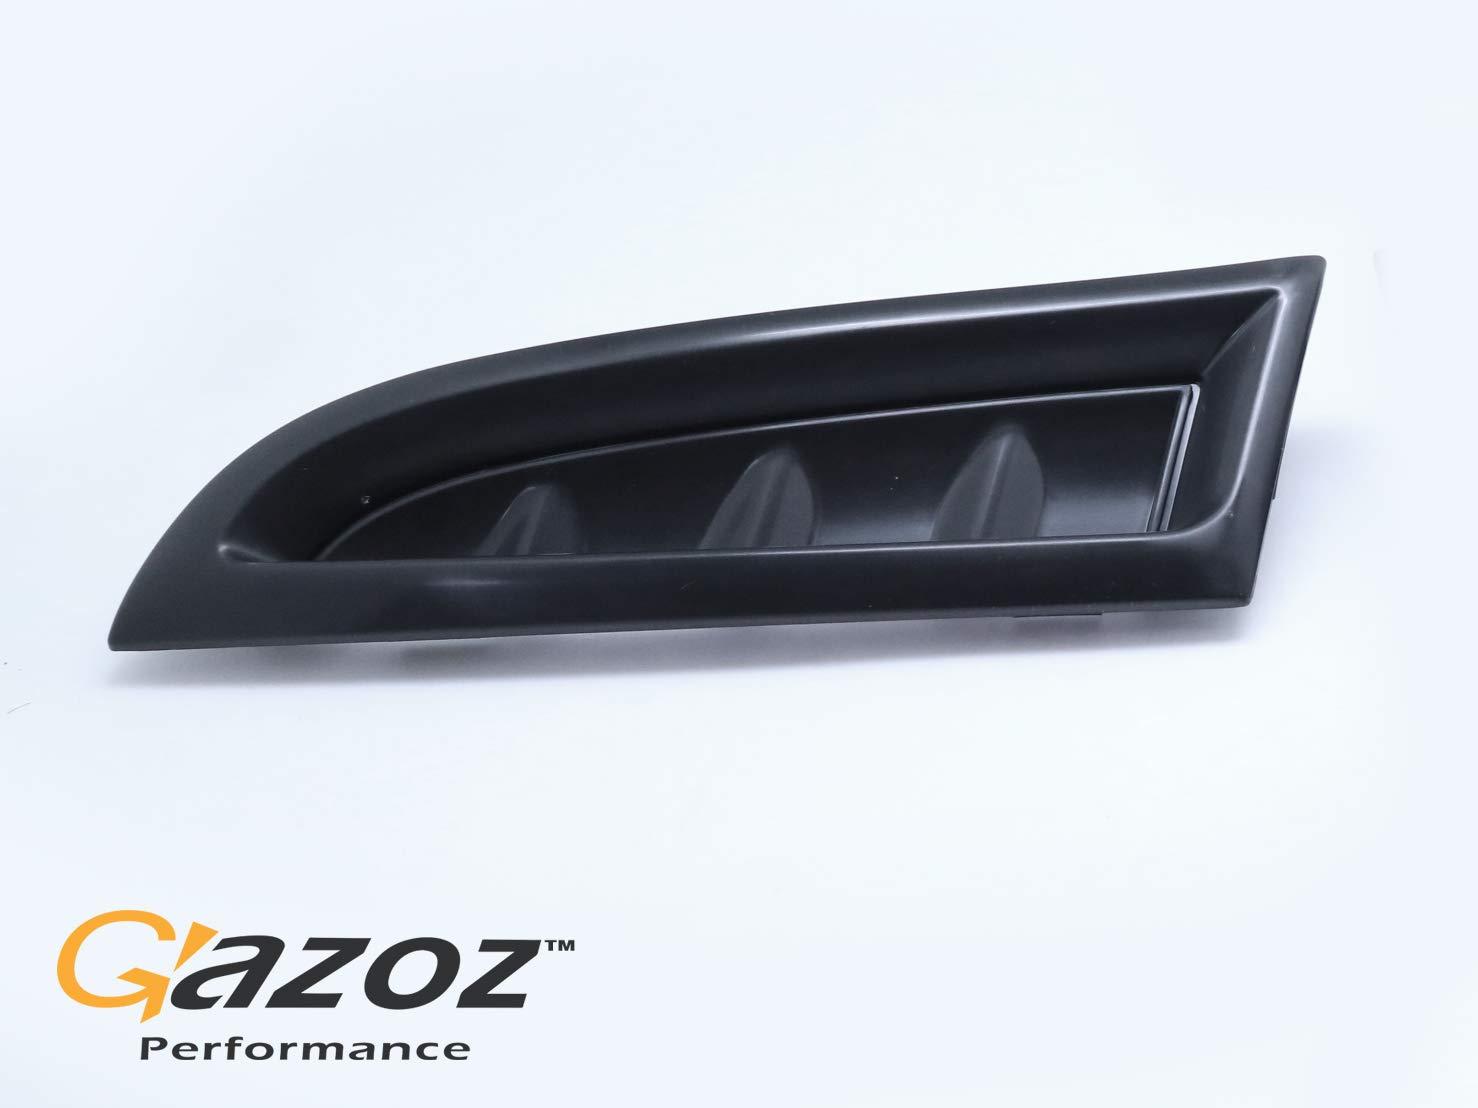 Black Prime Replacement Front Bumper Side Vent Covers RH+LH for 2006-2007 Subaru Impreza WRX STI 06 07 Subaru STi GDF GAZOZ PERFORMANCE Subaru Exterior Accessories